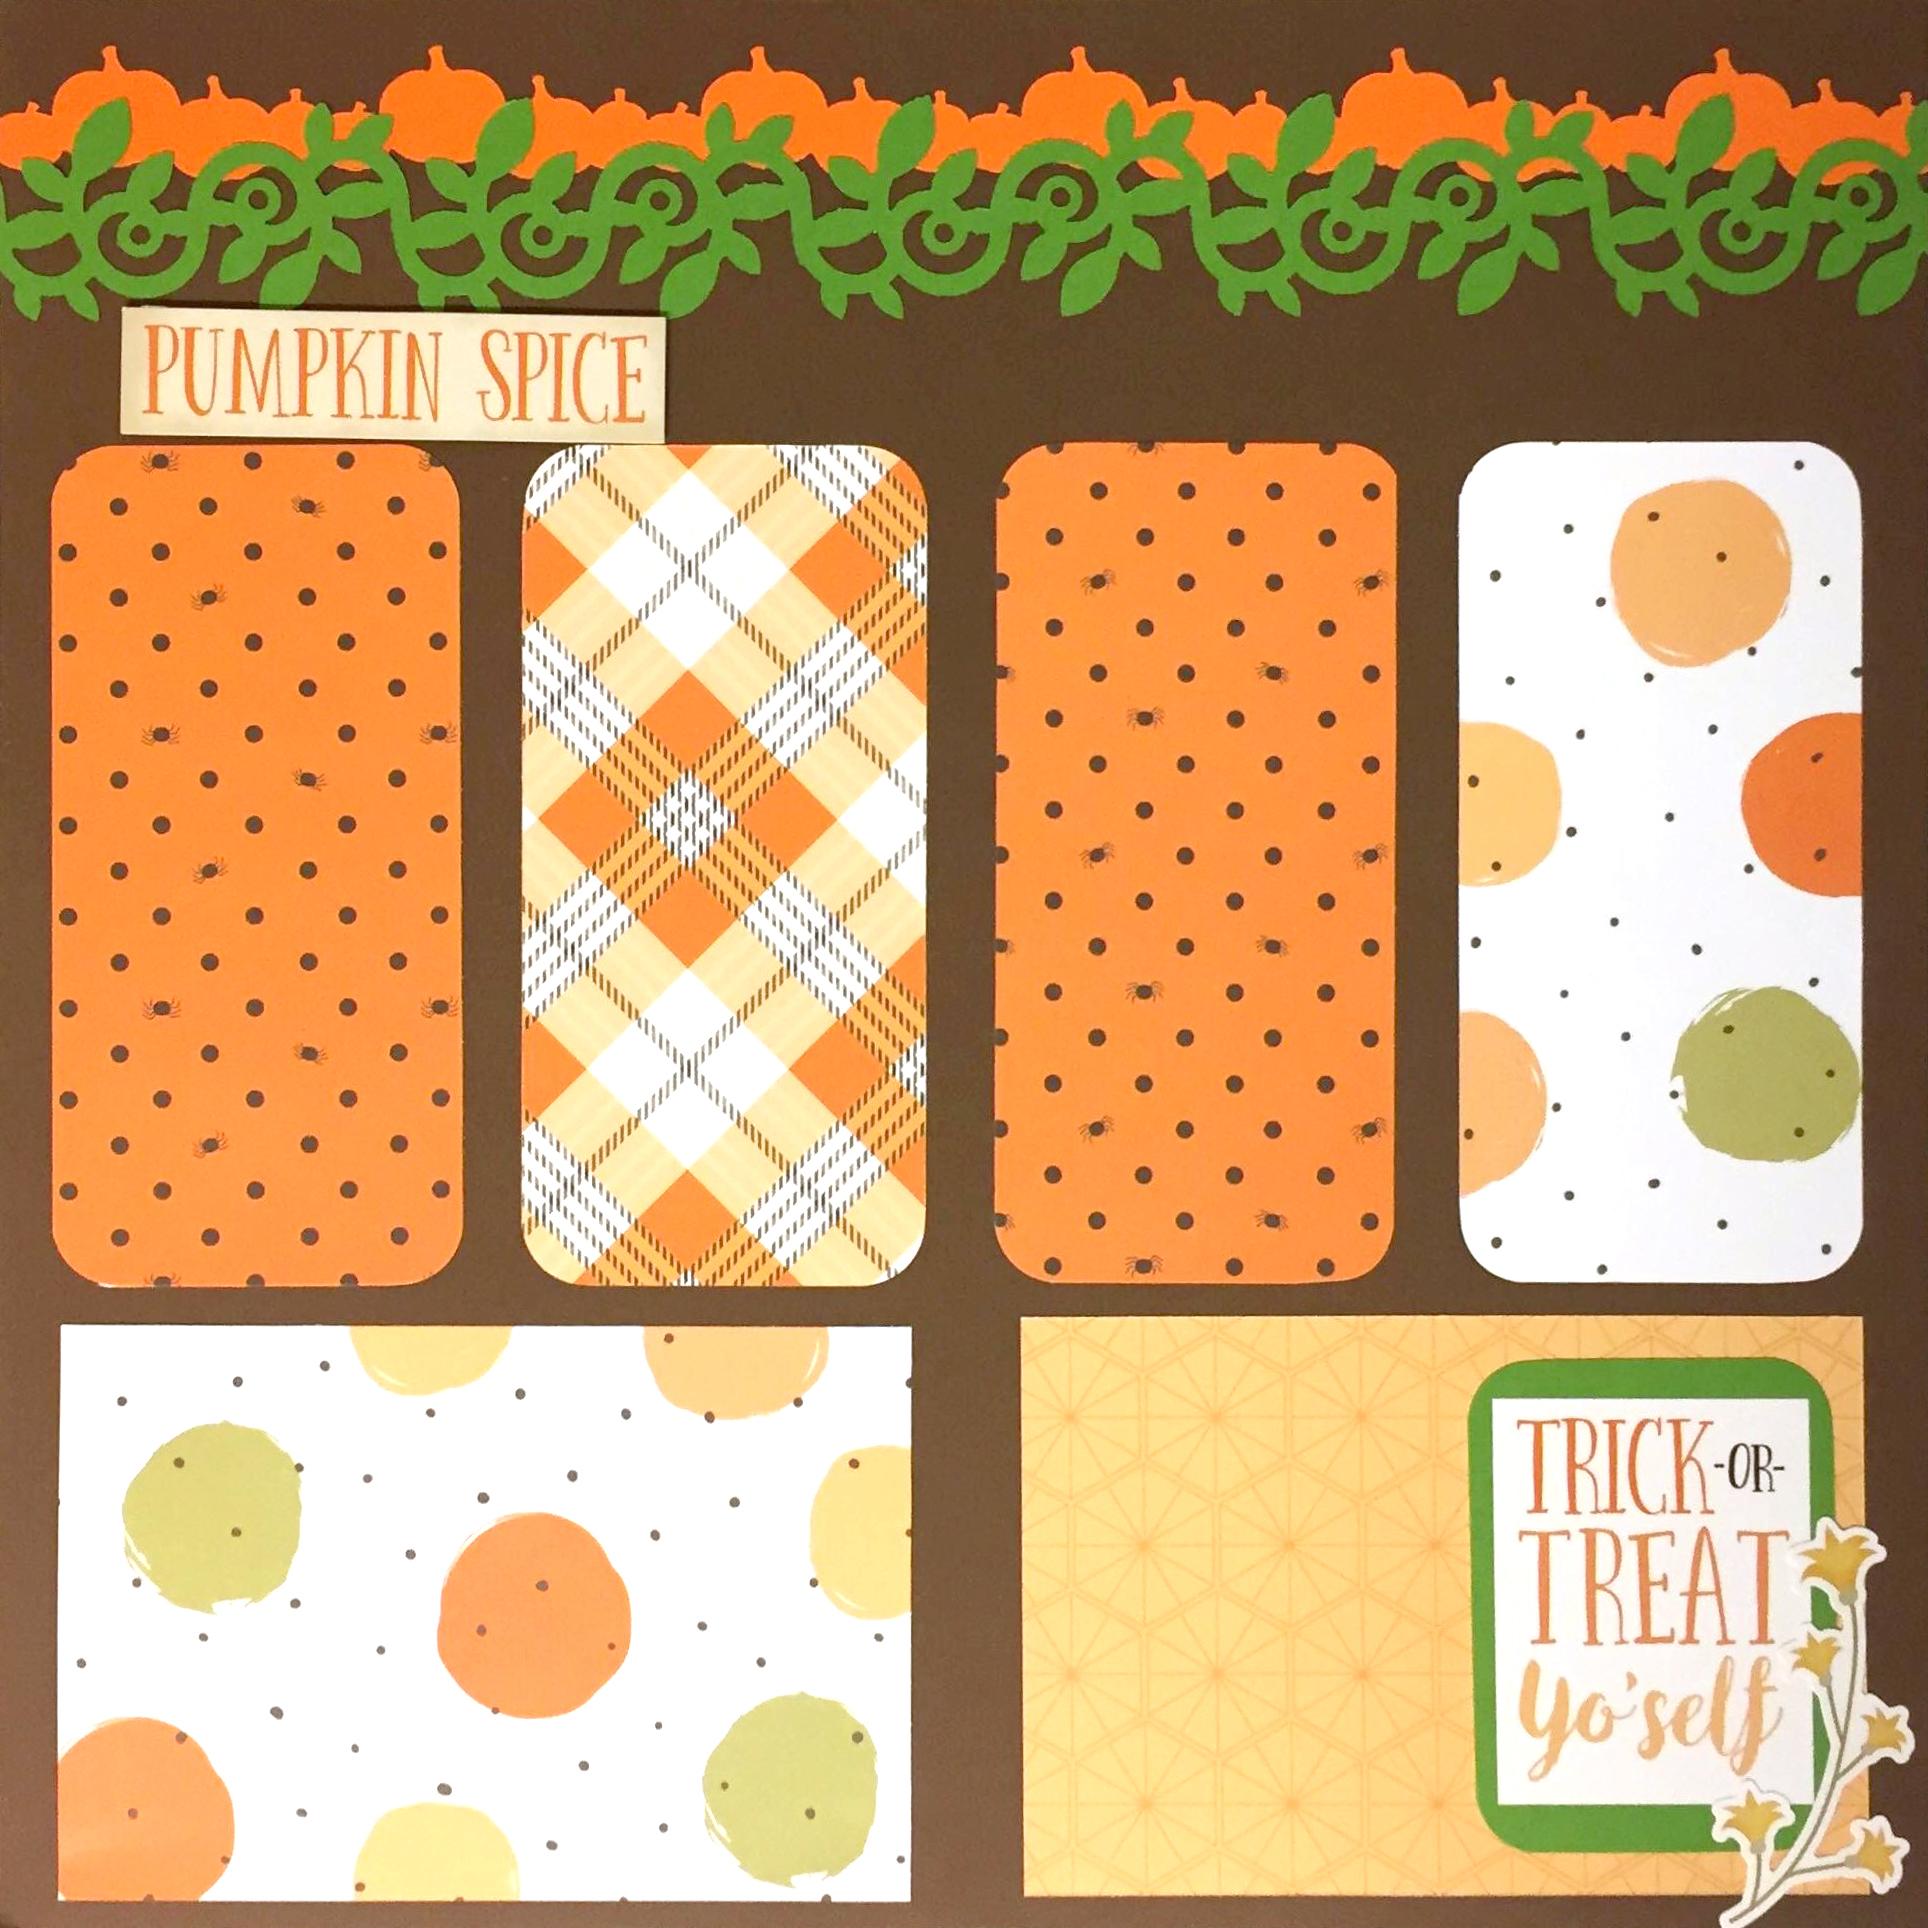 Virtual-Crop-Challenge6-Pumpkin-Spice-Creative-Memories2_retouched